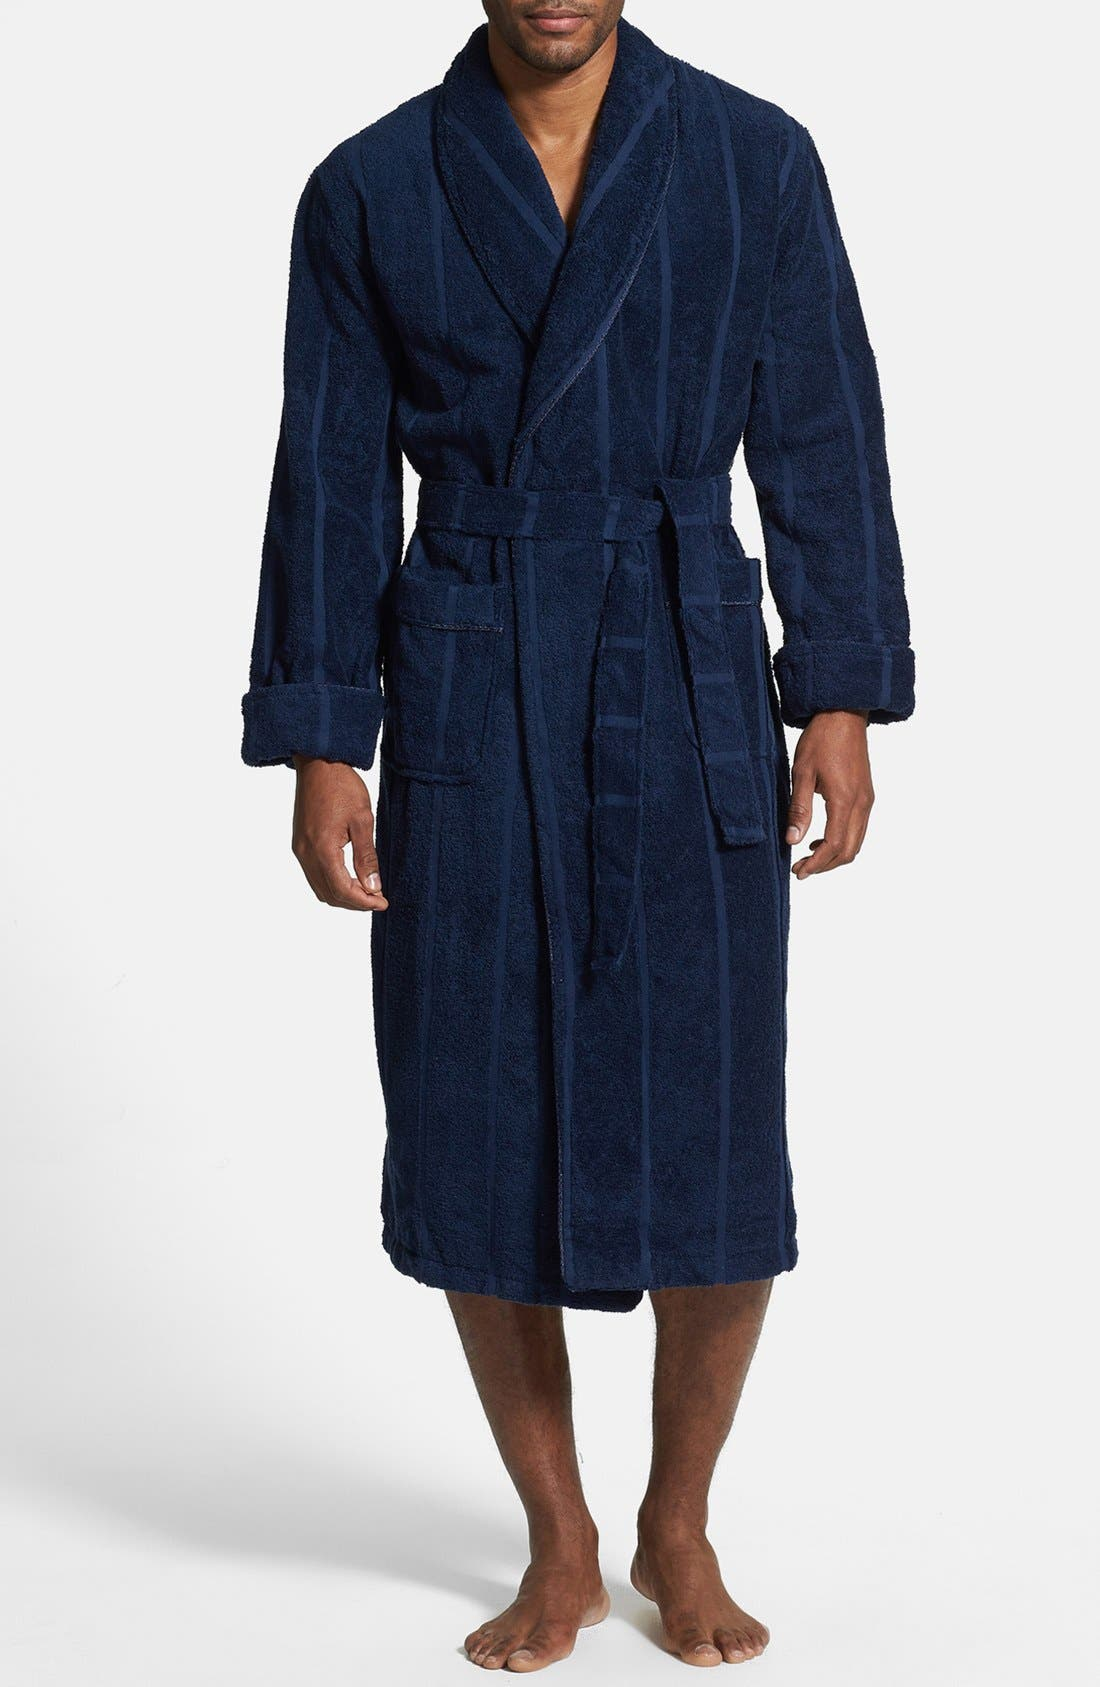 Ultra Lux Robe,                             Main thumbnail 1, color,                             Marine